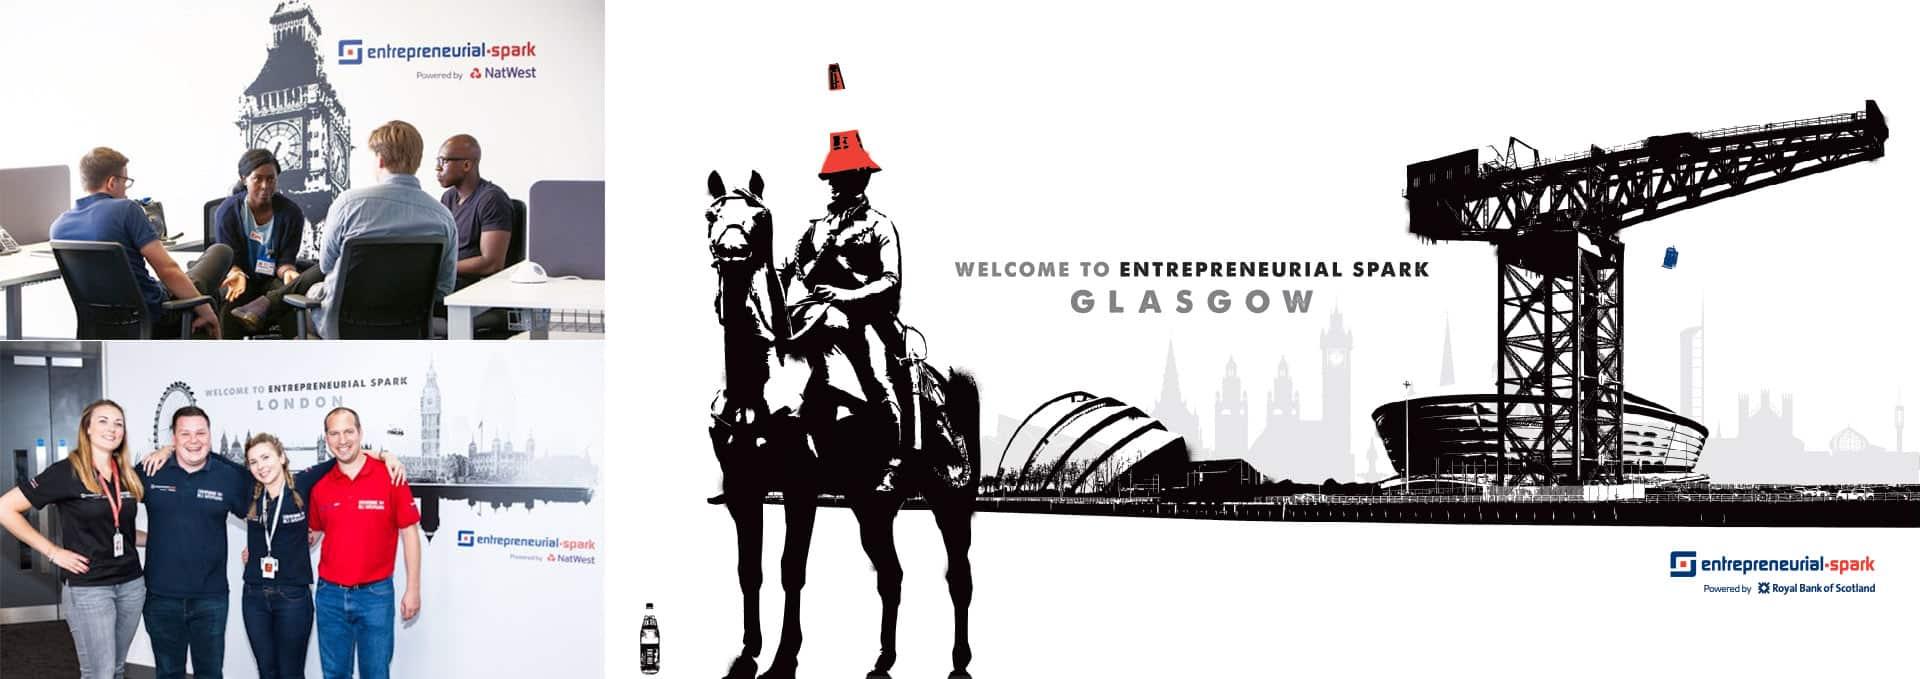 Ent Spark Glasgow